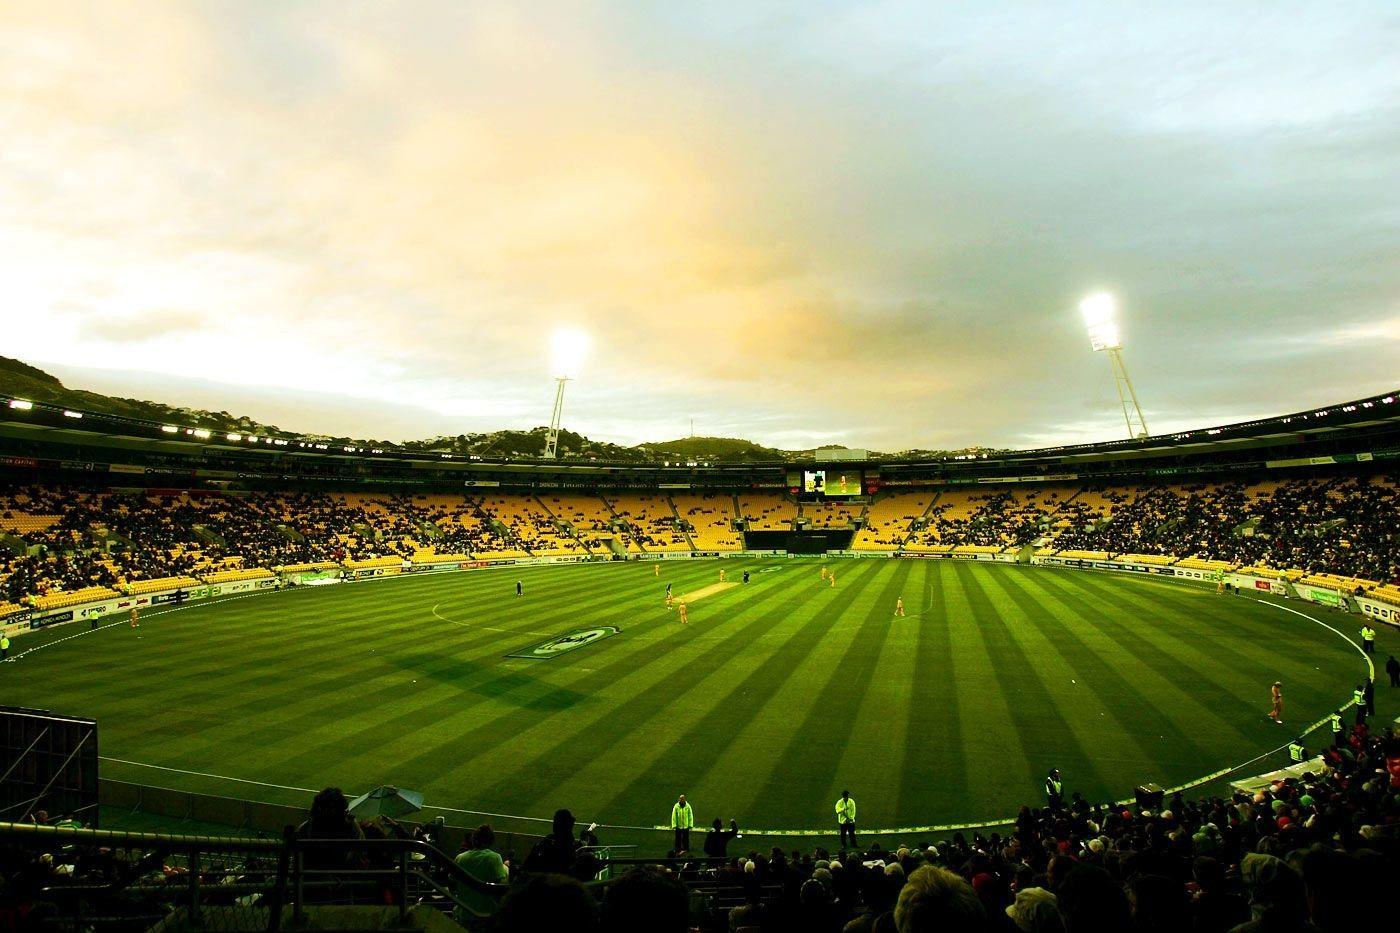 mcc cricket ground - HD1400×933